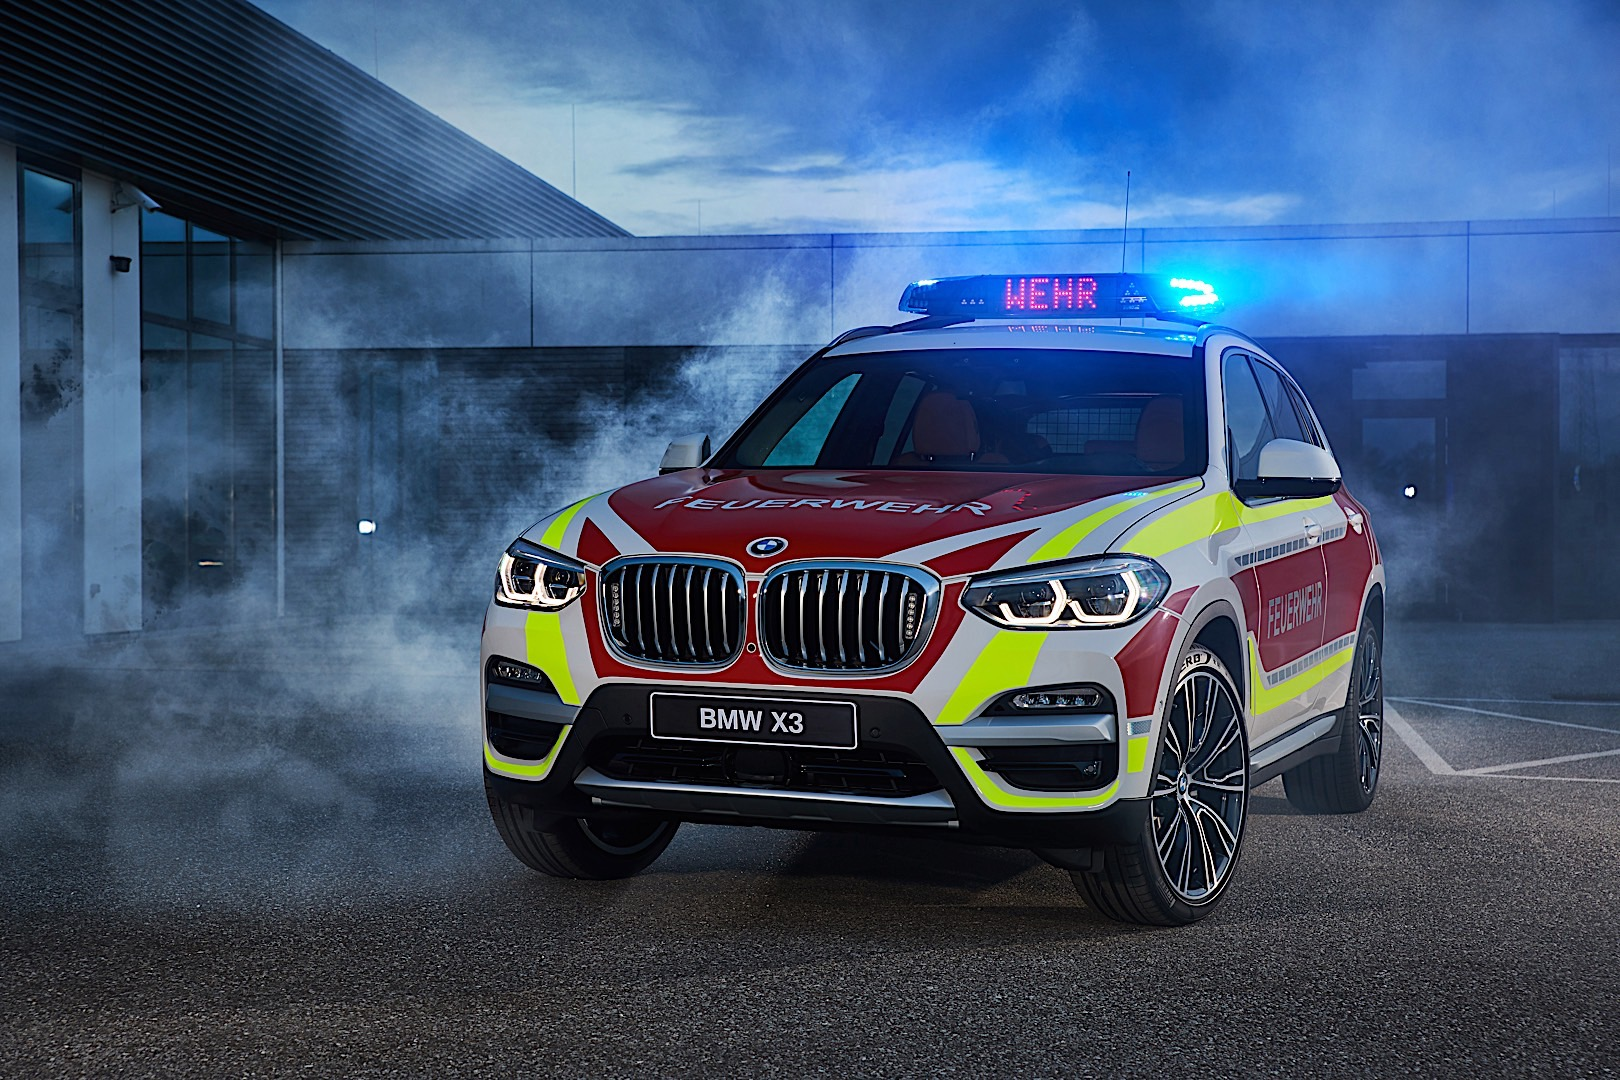 BMW X3 Emergency VehicleP90304783 highRes